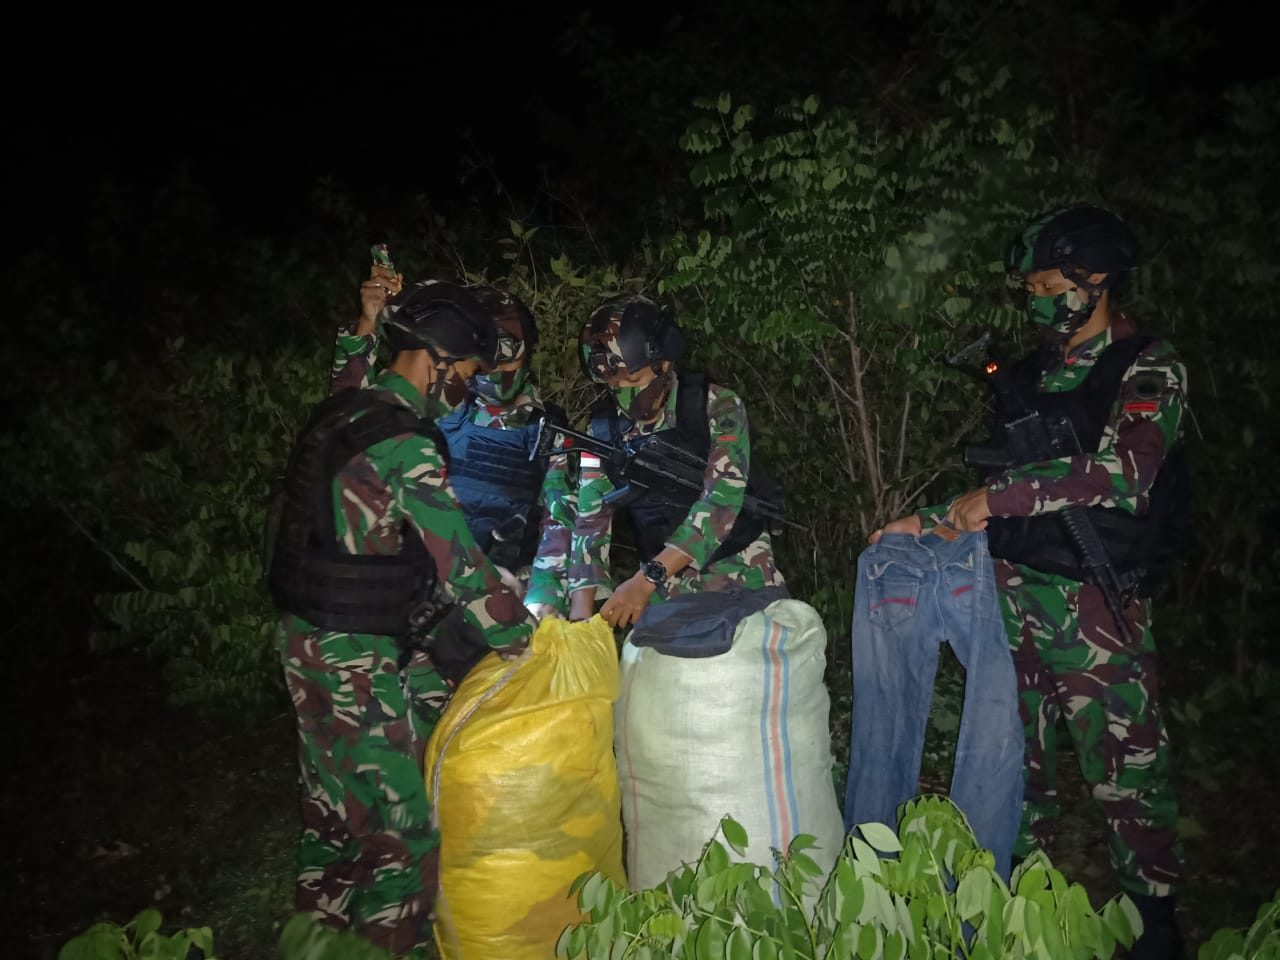 Penyelundupan 2 Karung Pakaian Bekas Digagalkan Satgas Yonarmed 3/105 Tarik di Perbatasan RI-RDTL